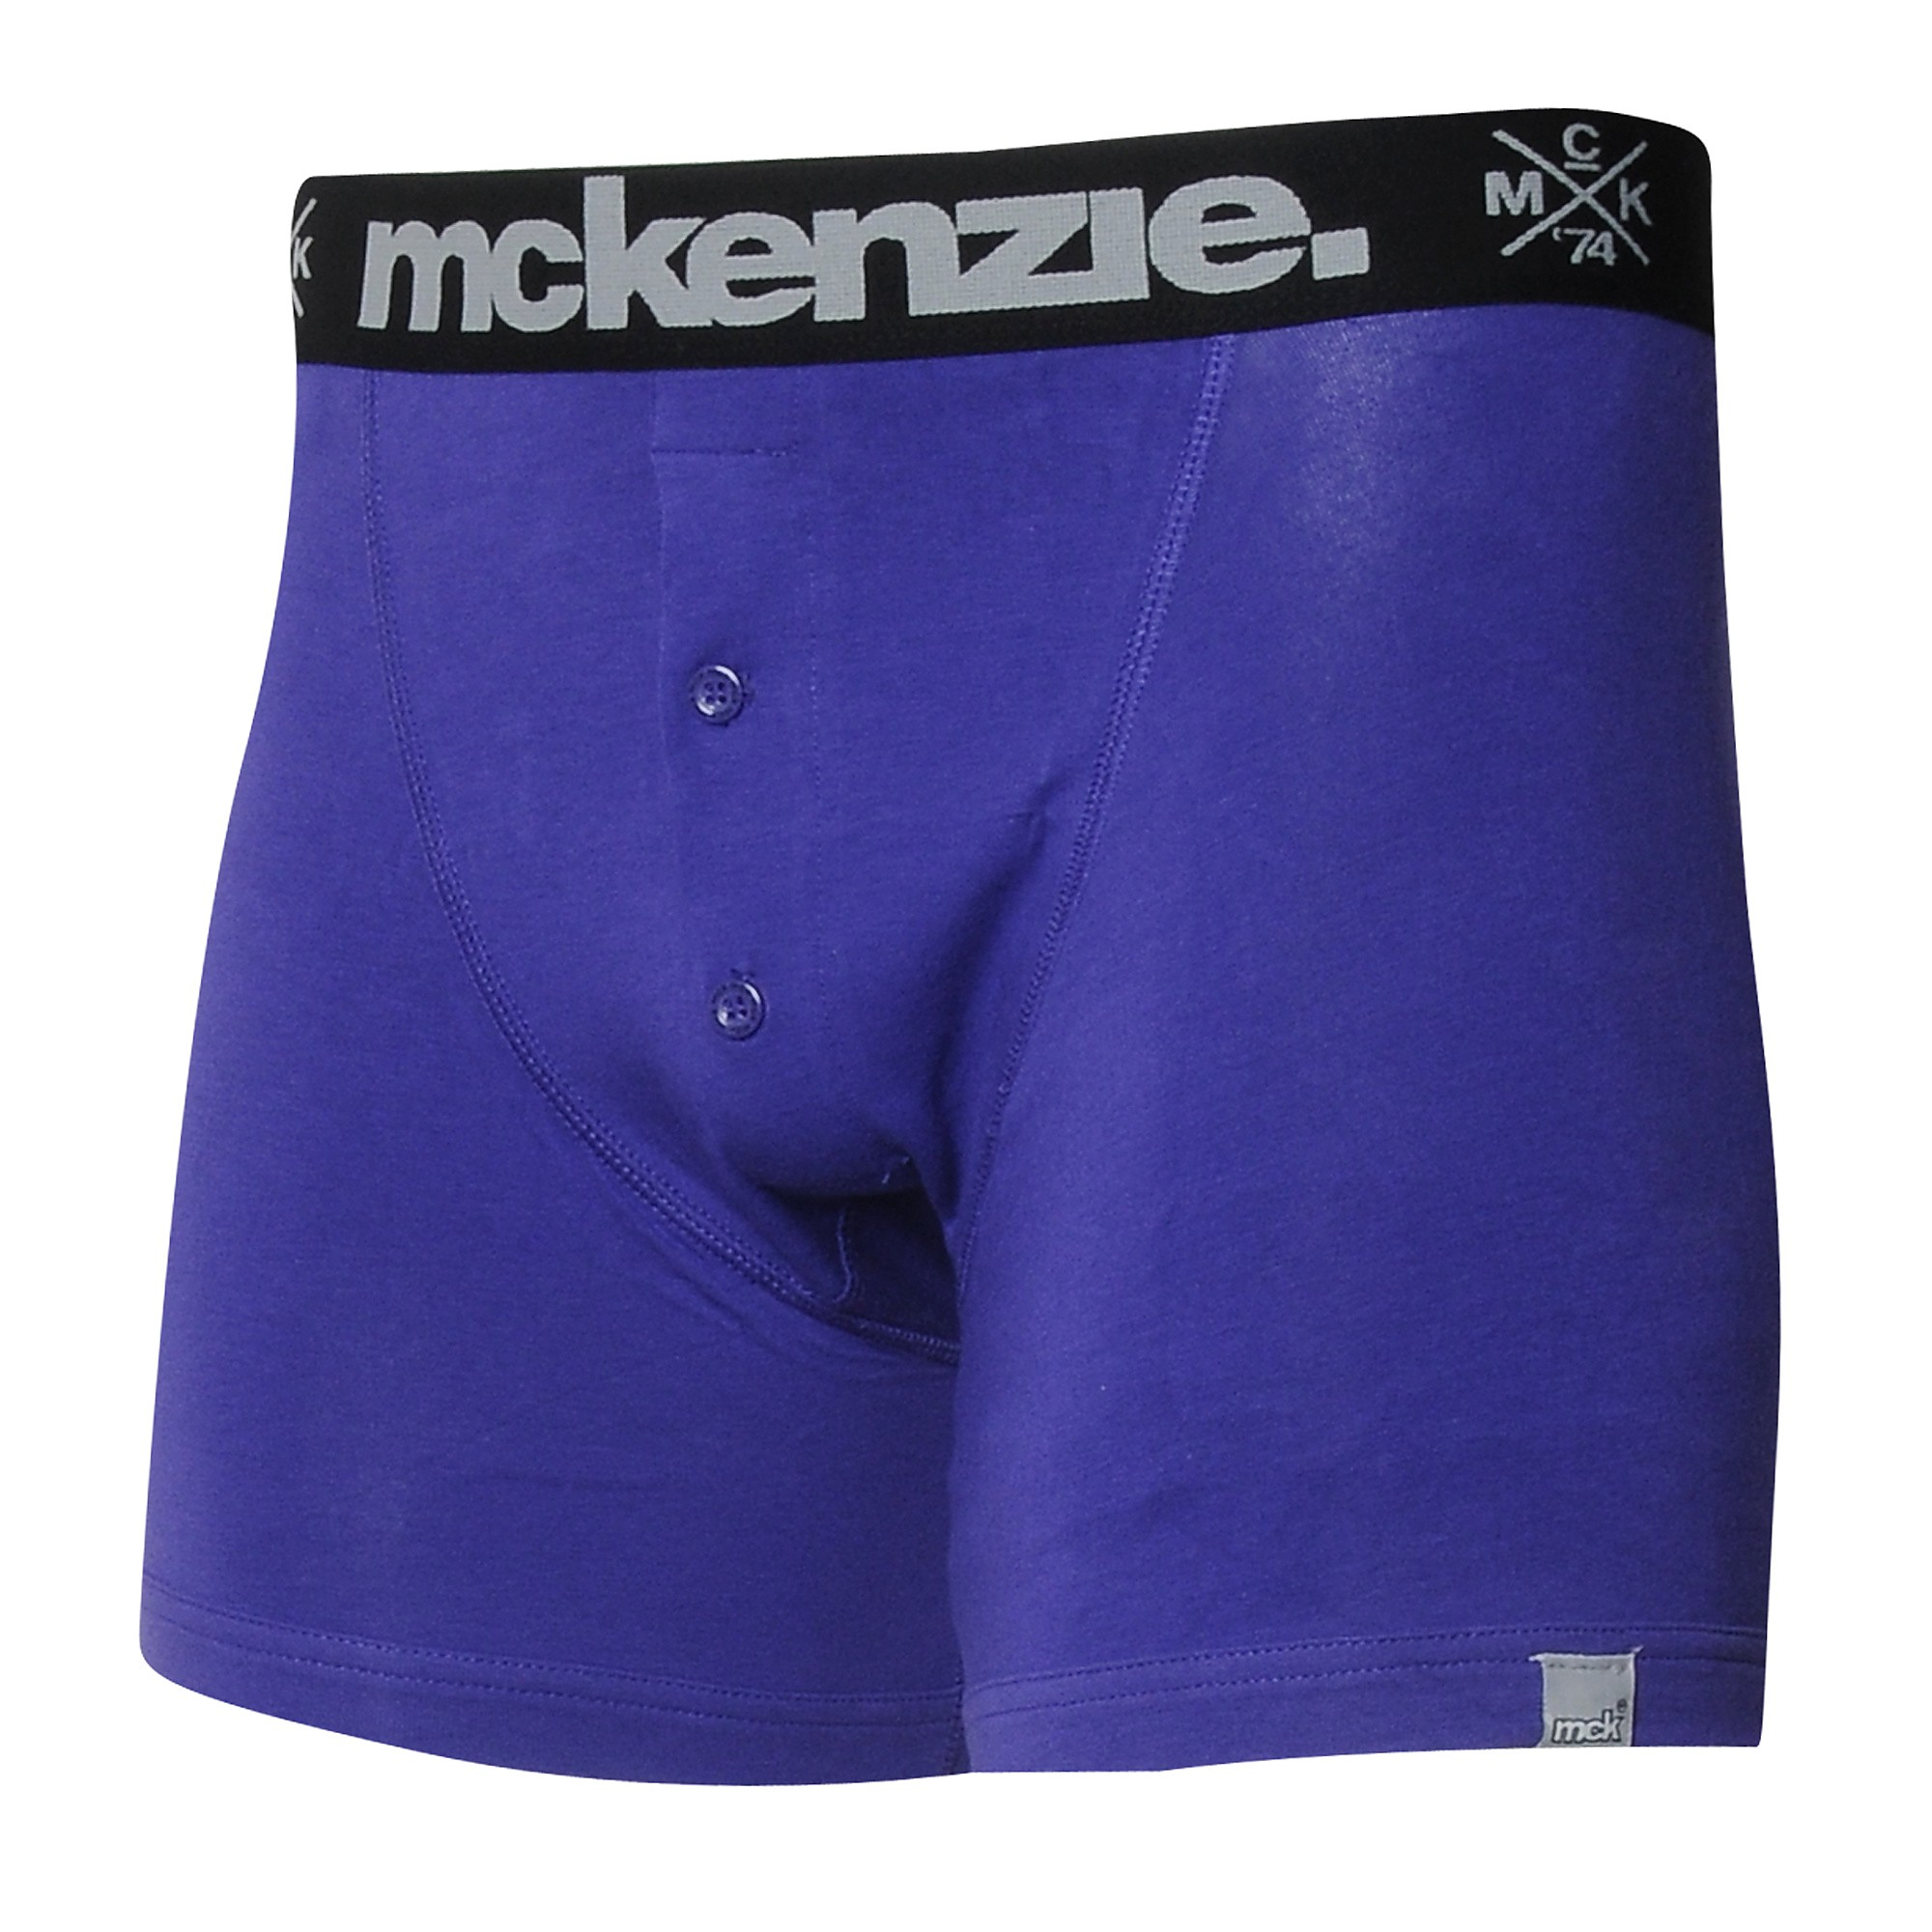 McKenzie Nelson Boxer Shorts